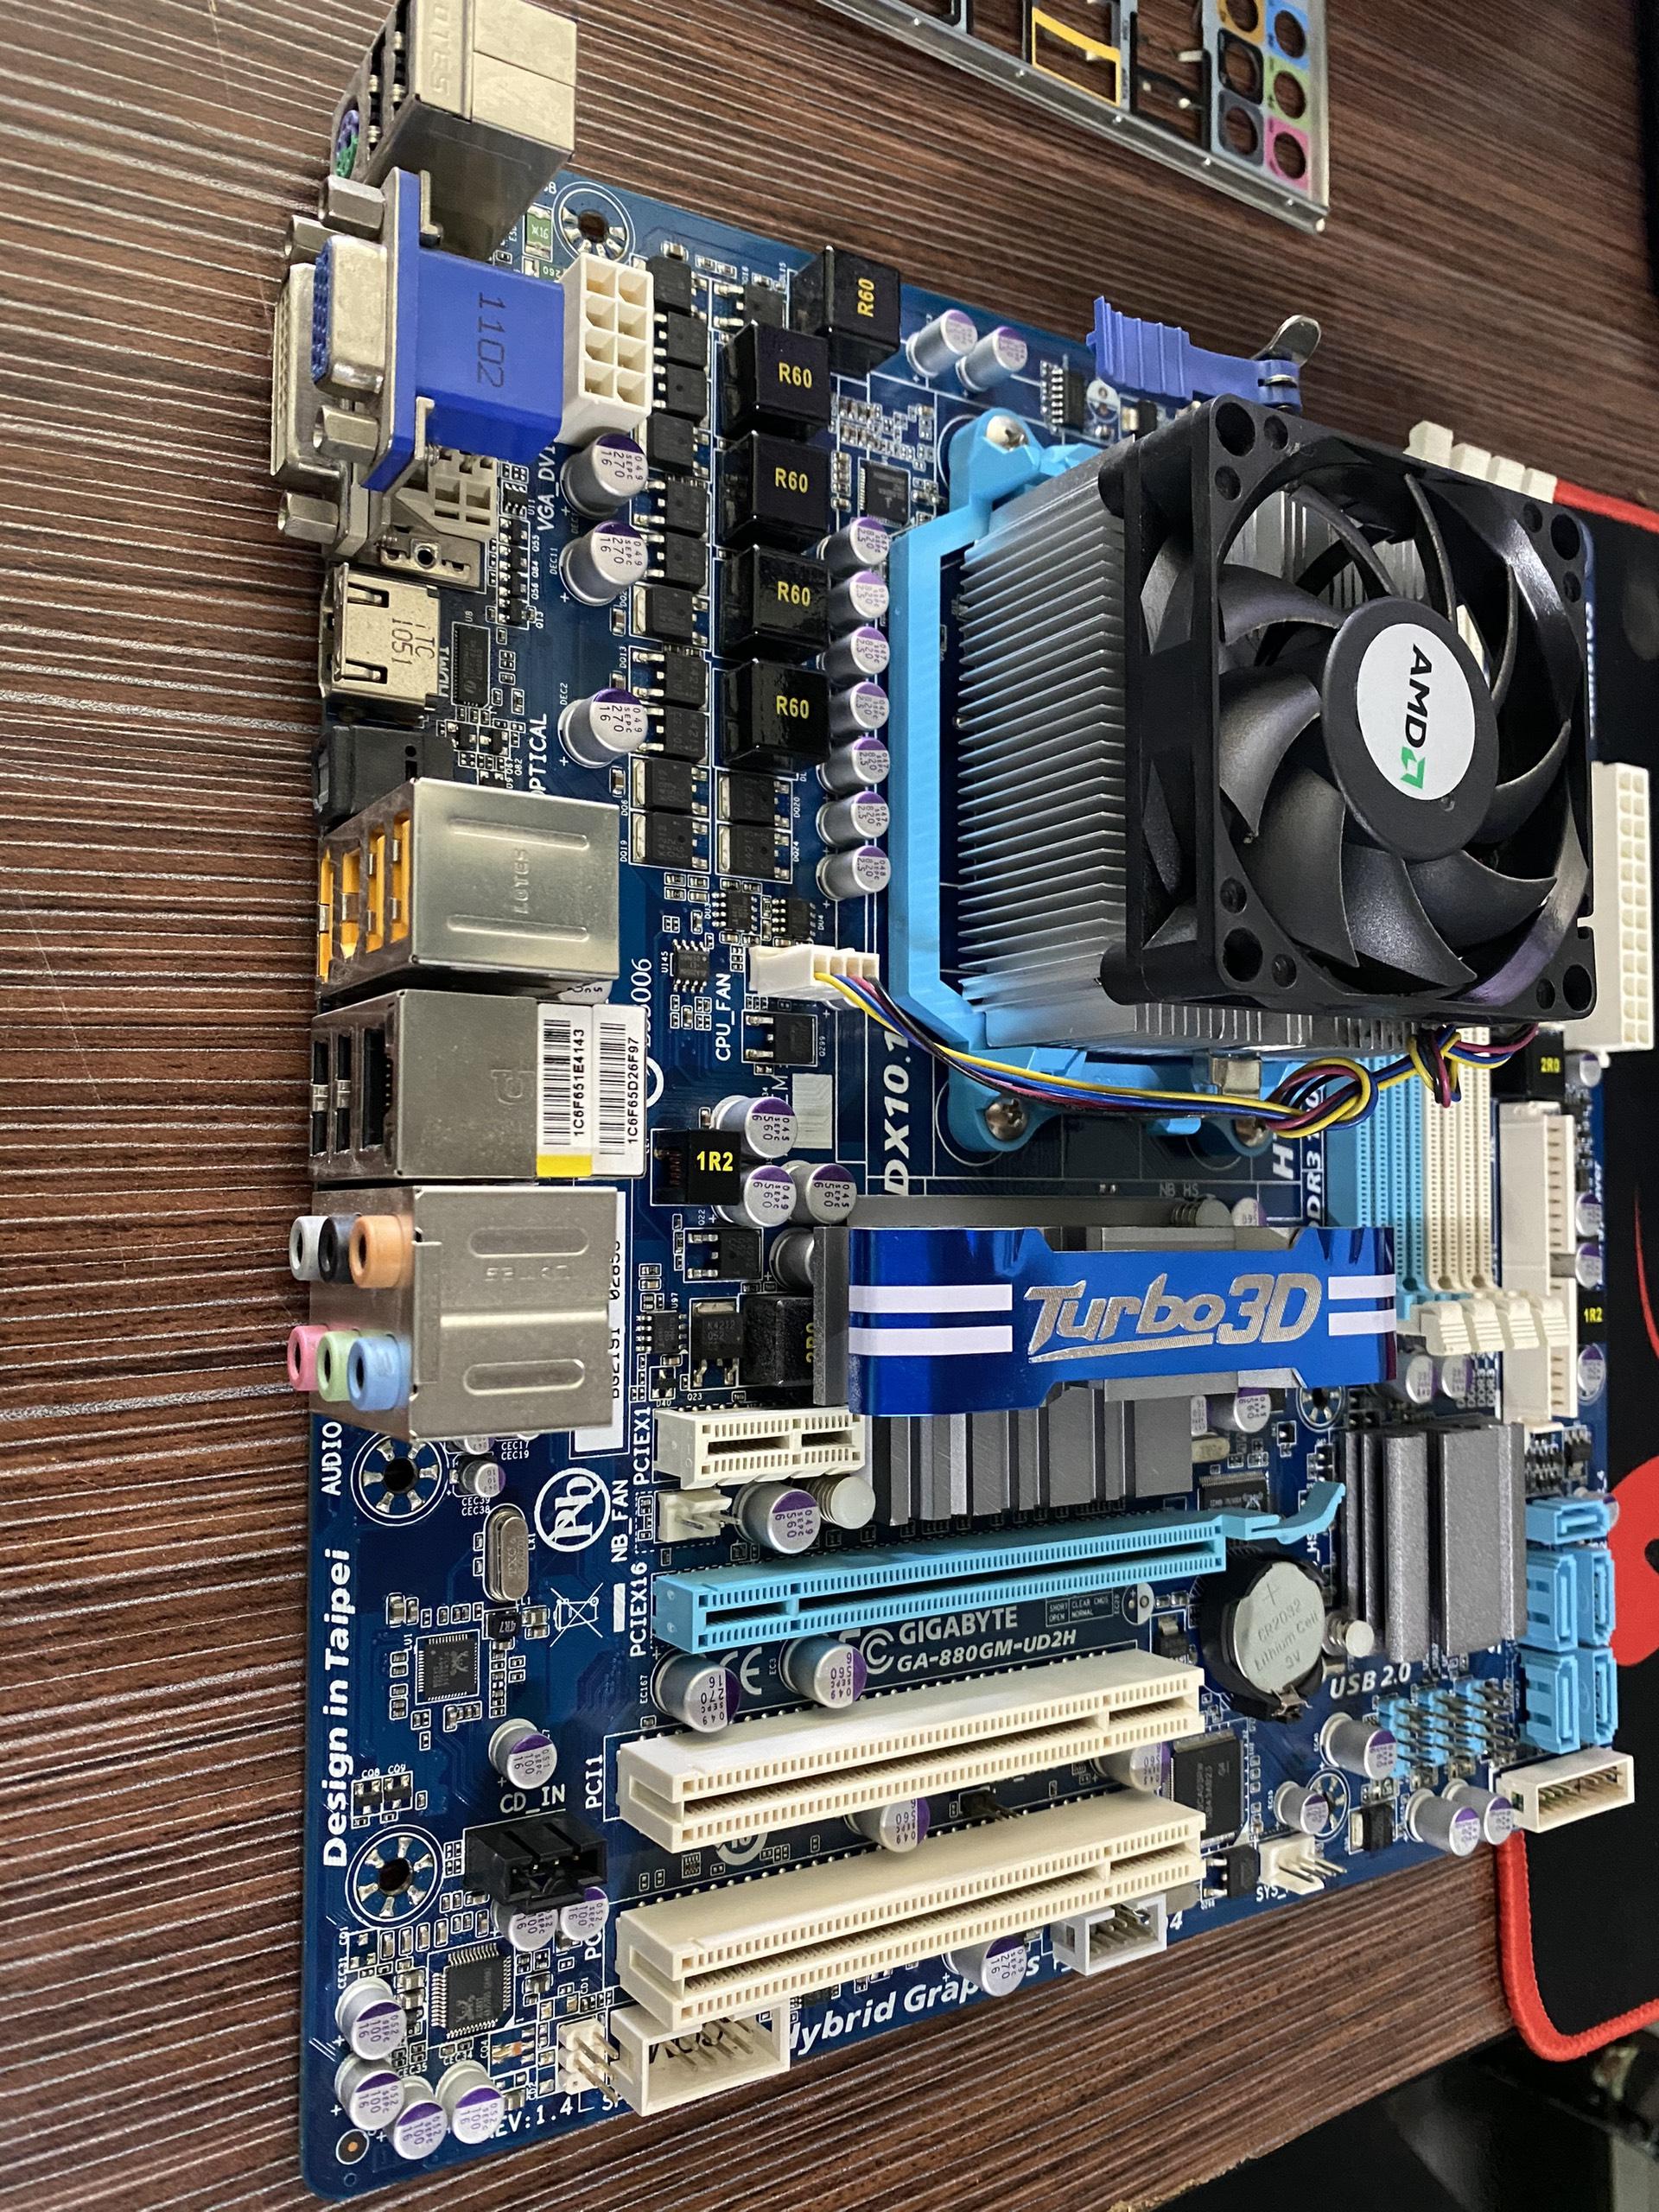 combo main gigabyte GA-880GM-UD3H VÀ CPU AMD Athlon II X4 635 2.9 GHz Quad-Core